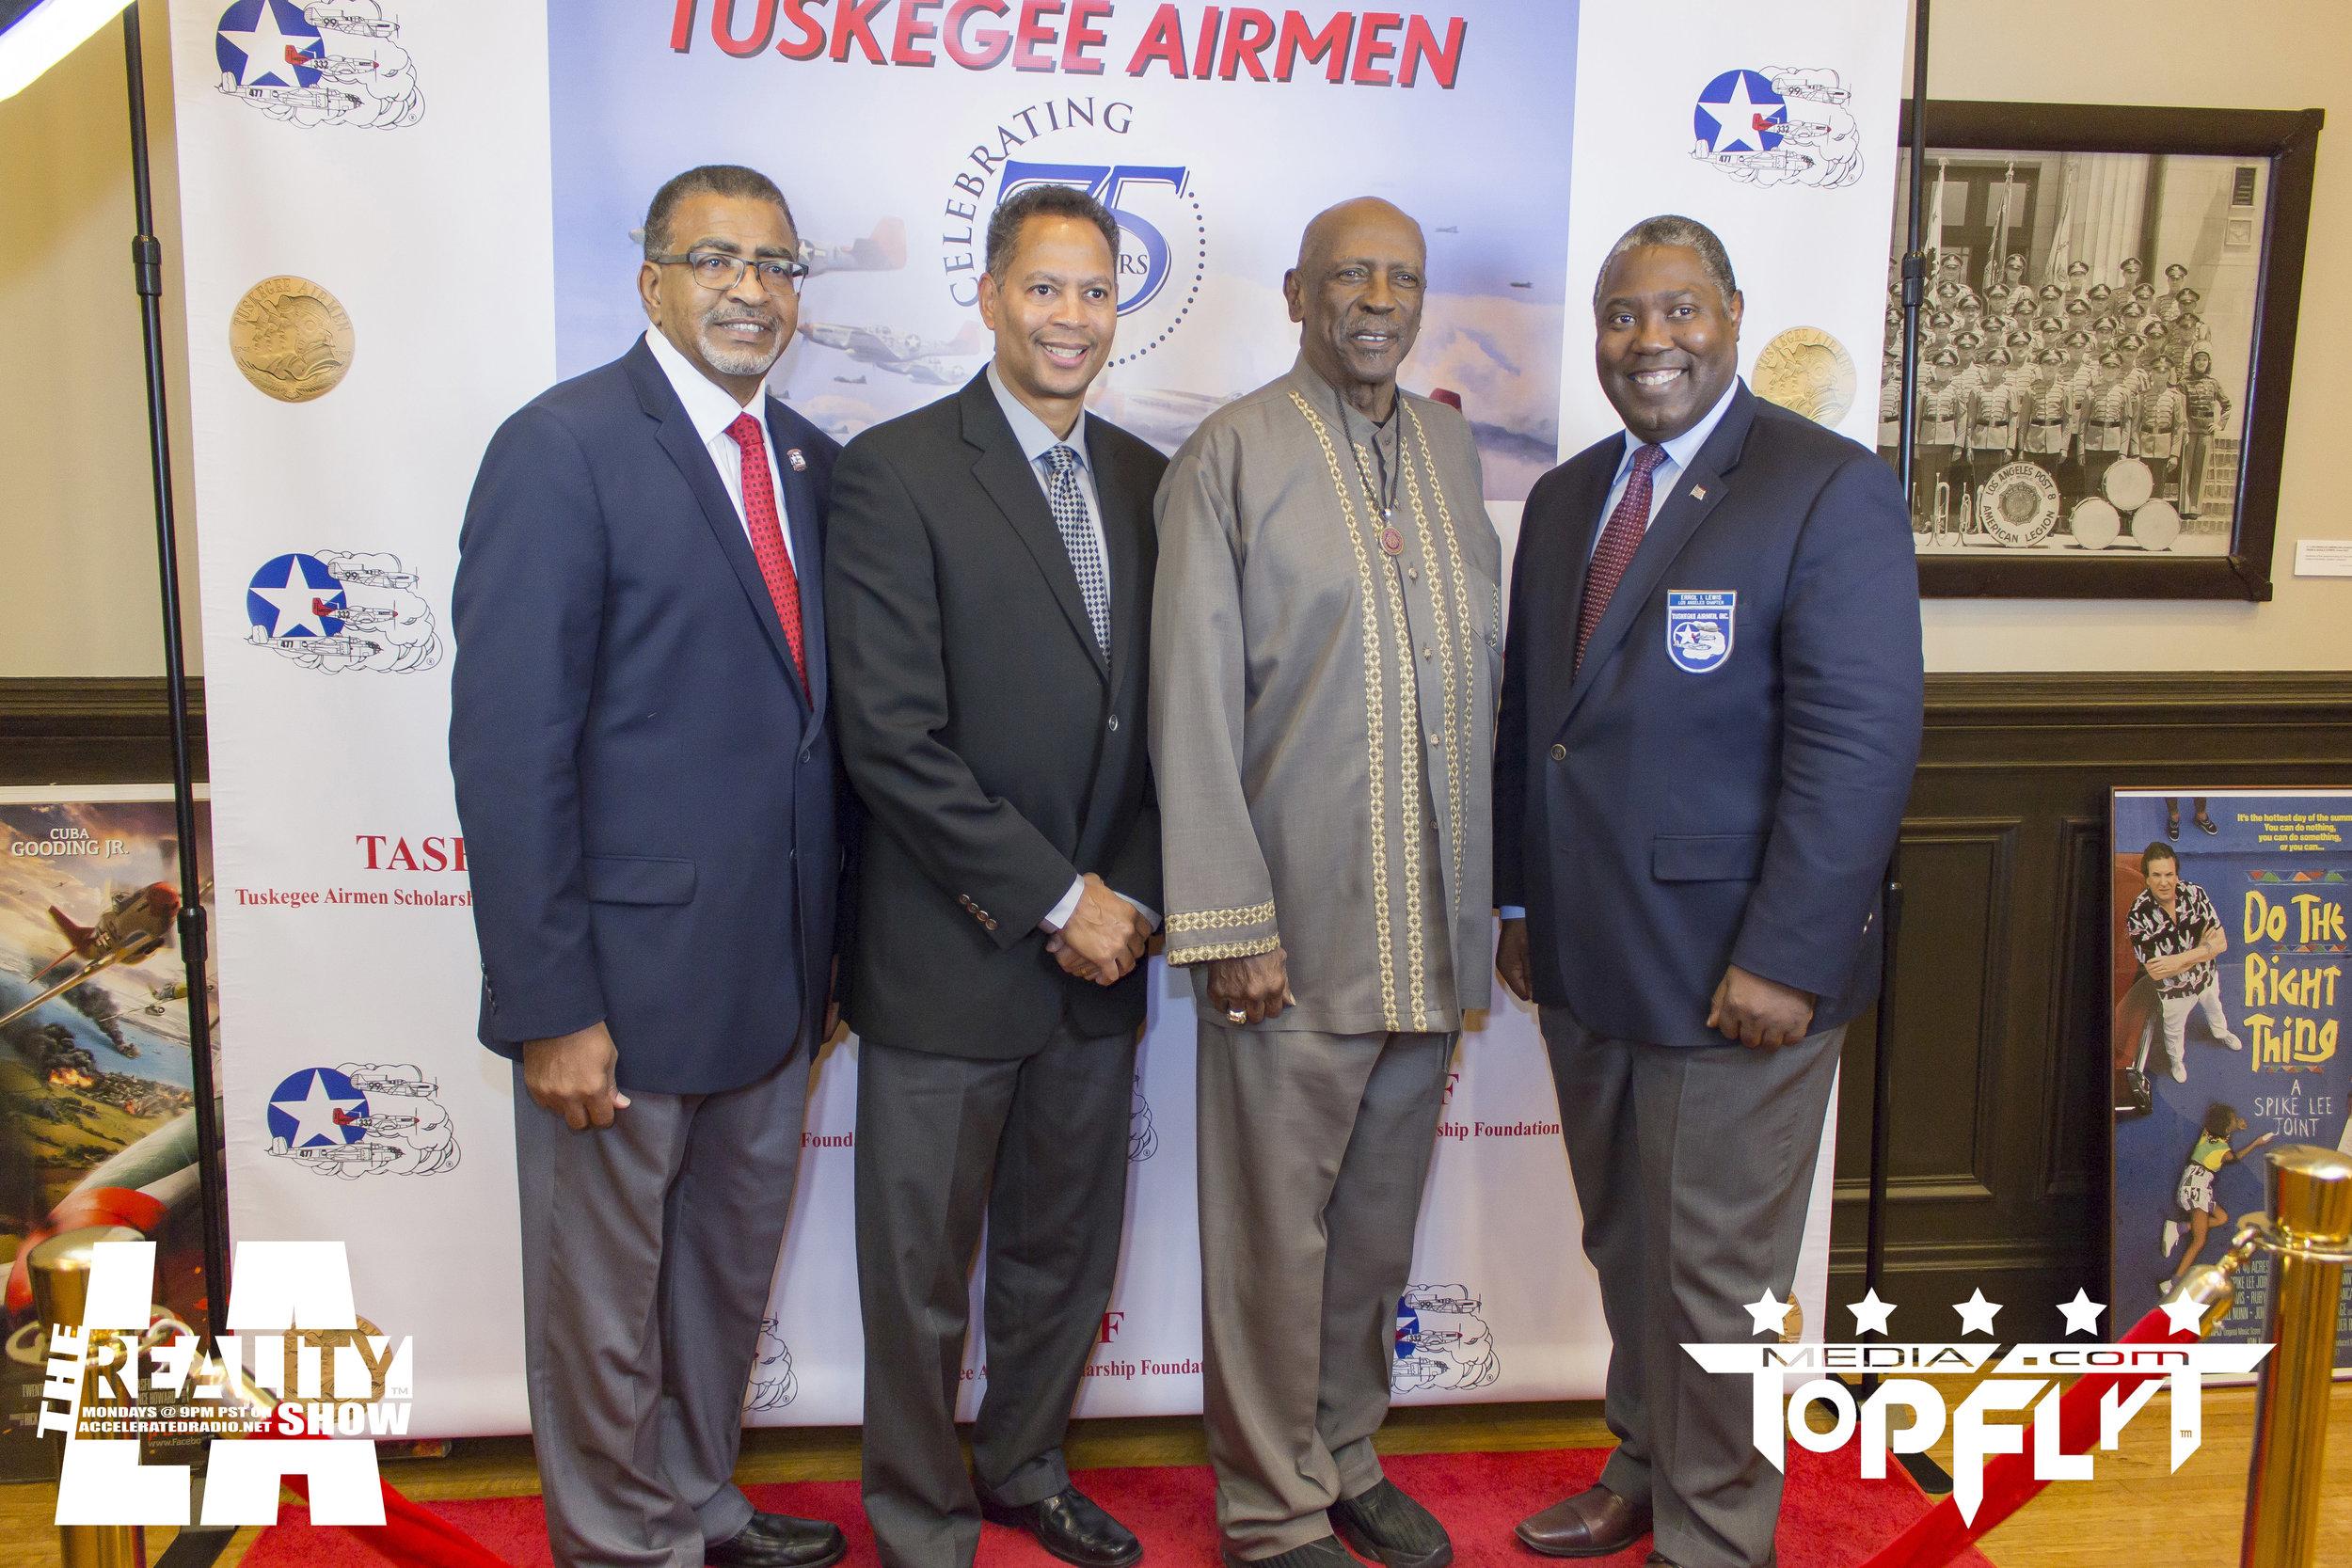 The Reality Show LA - Tuskegee Airmen 75th Anniversary VIP Reception_67.jpg